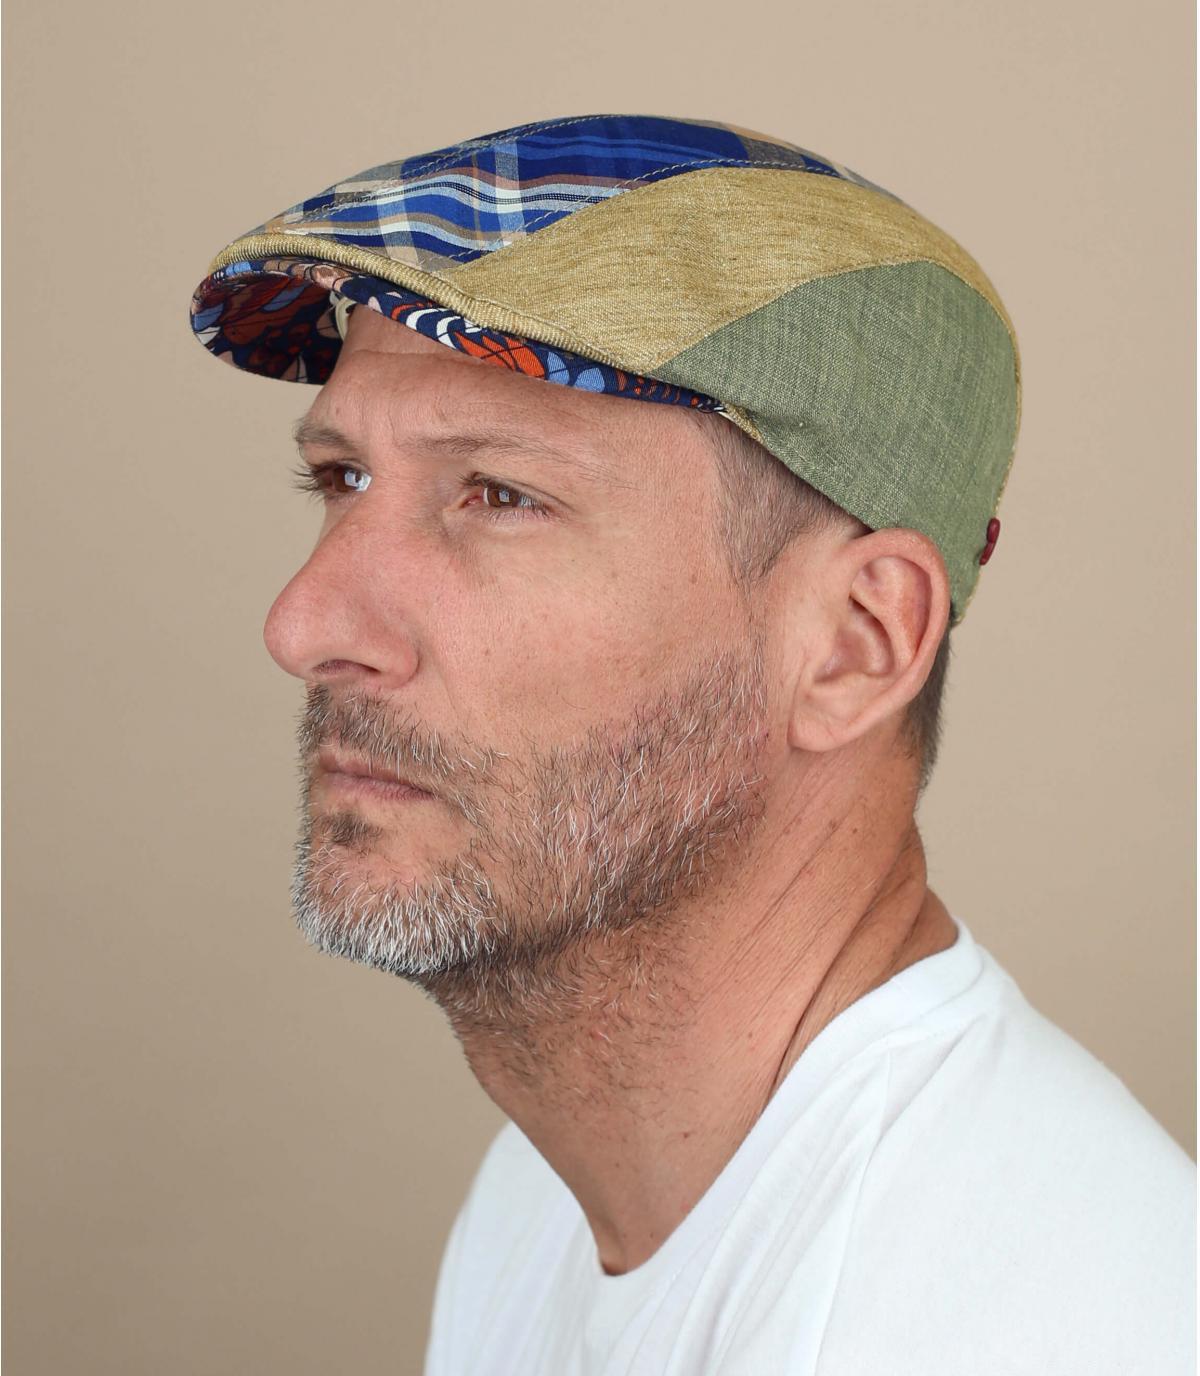 Blue beige linen cap